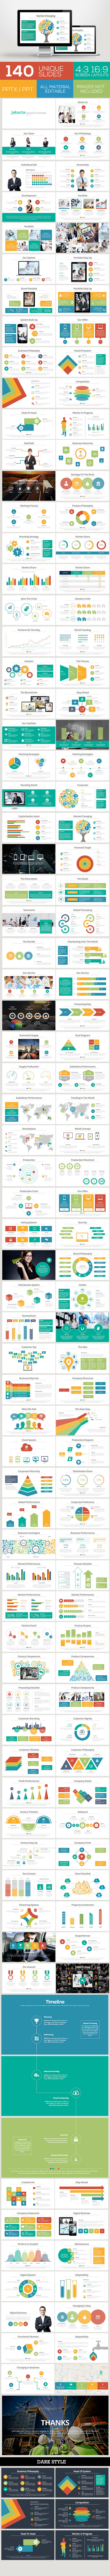 Jakarta Powerpoint Template Volume I - Business PowerPoint Templates